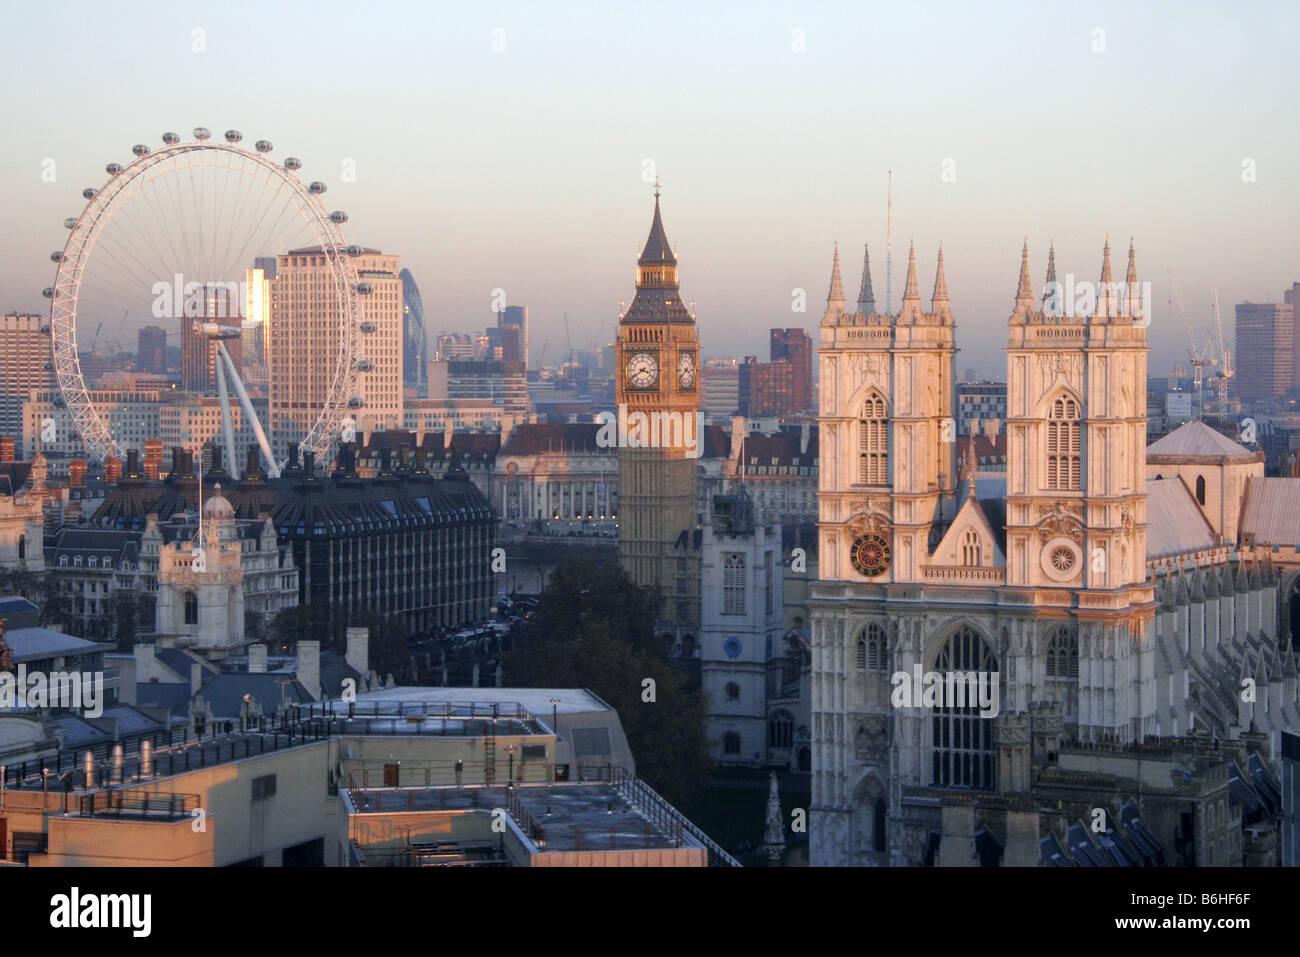 London Hotel Plaza Westminster